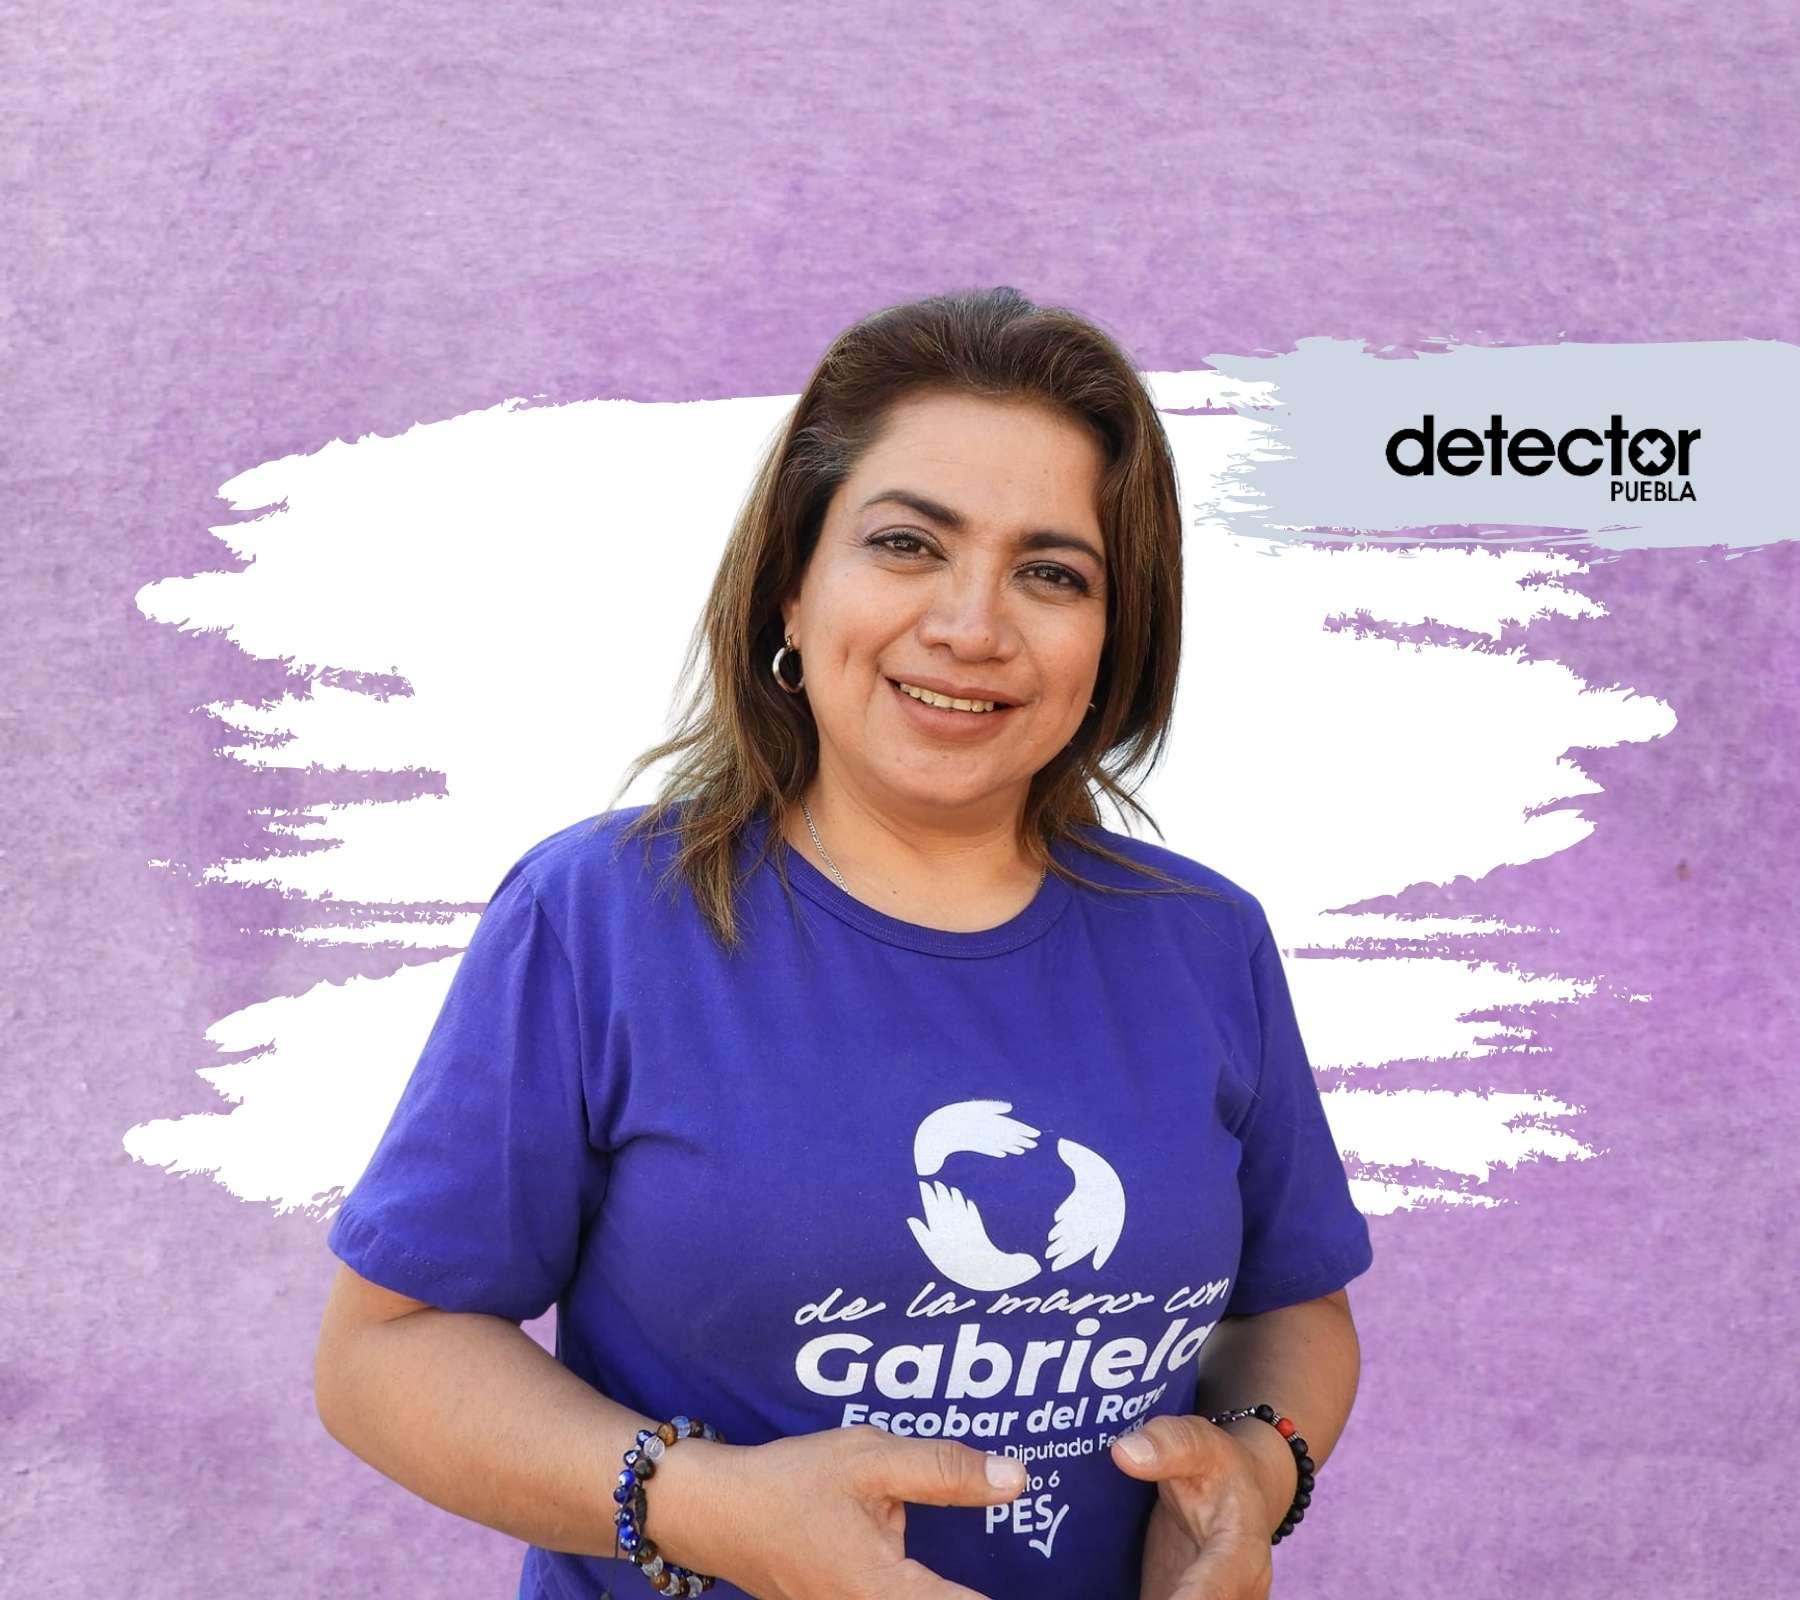 Gabriela Escobar PES Puebla